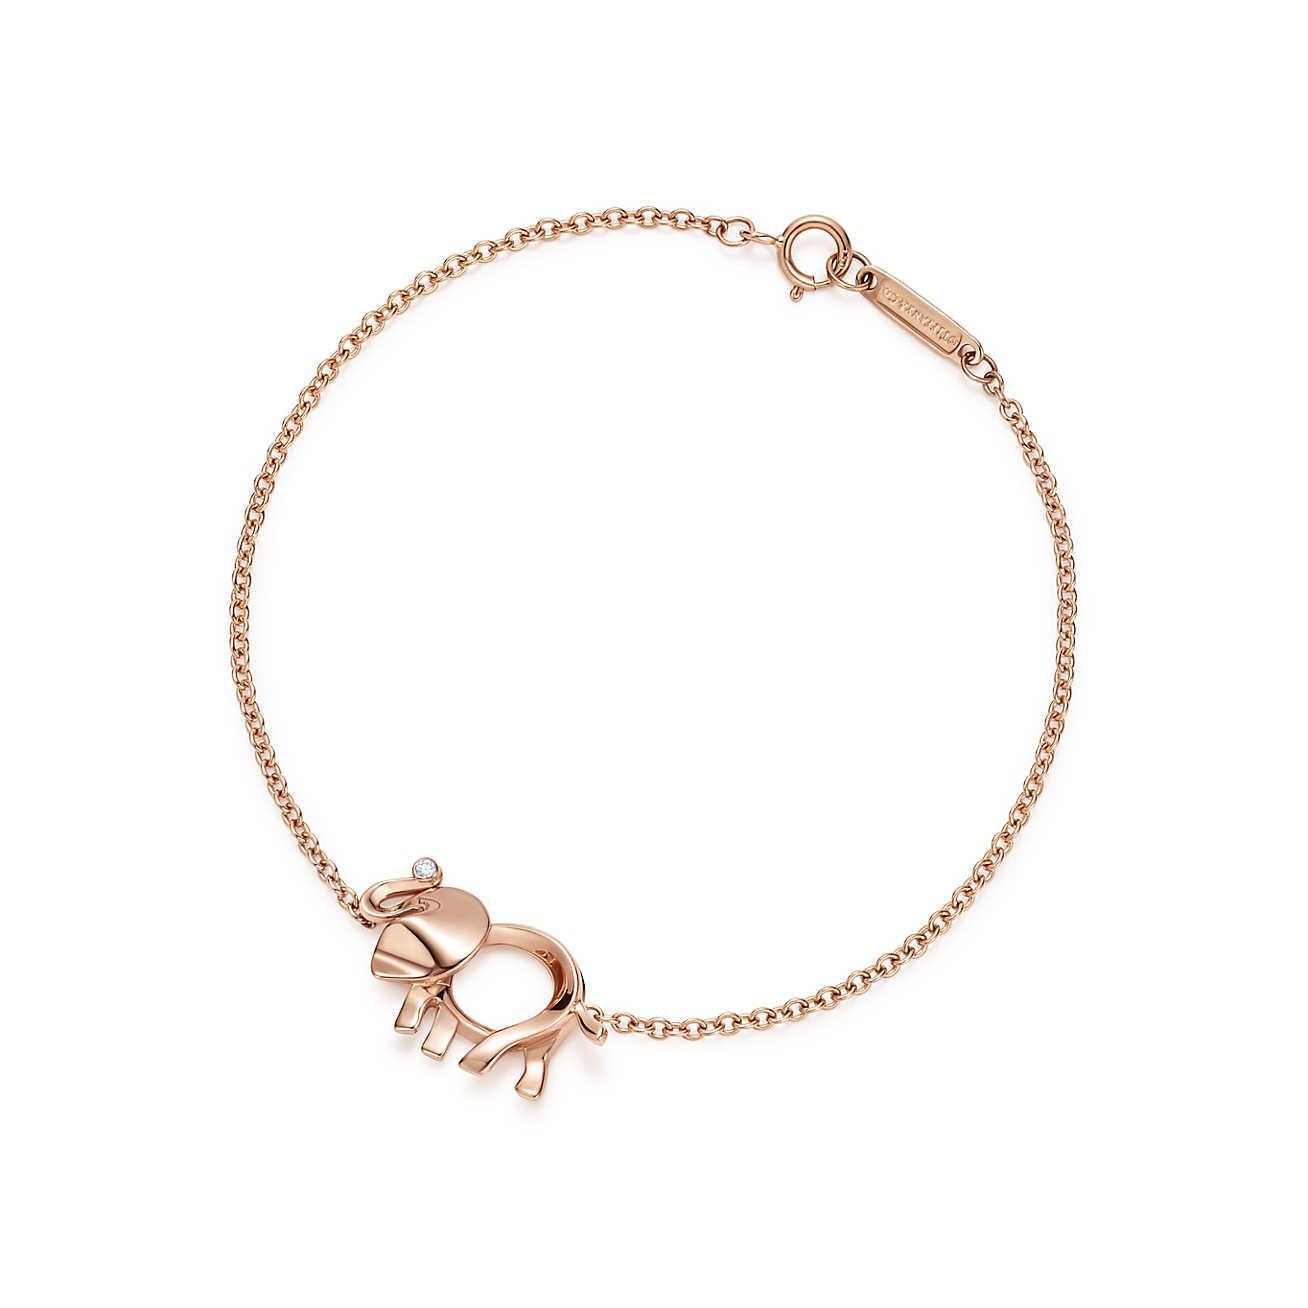 9ed7eb478 Tiffany & Co. Tiffany Save The Wild Elephant Charm Bracelet In 18k ...